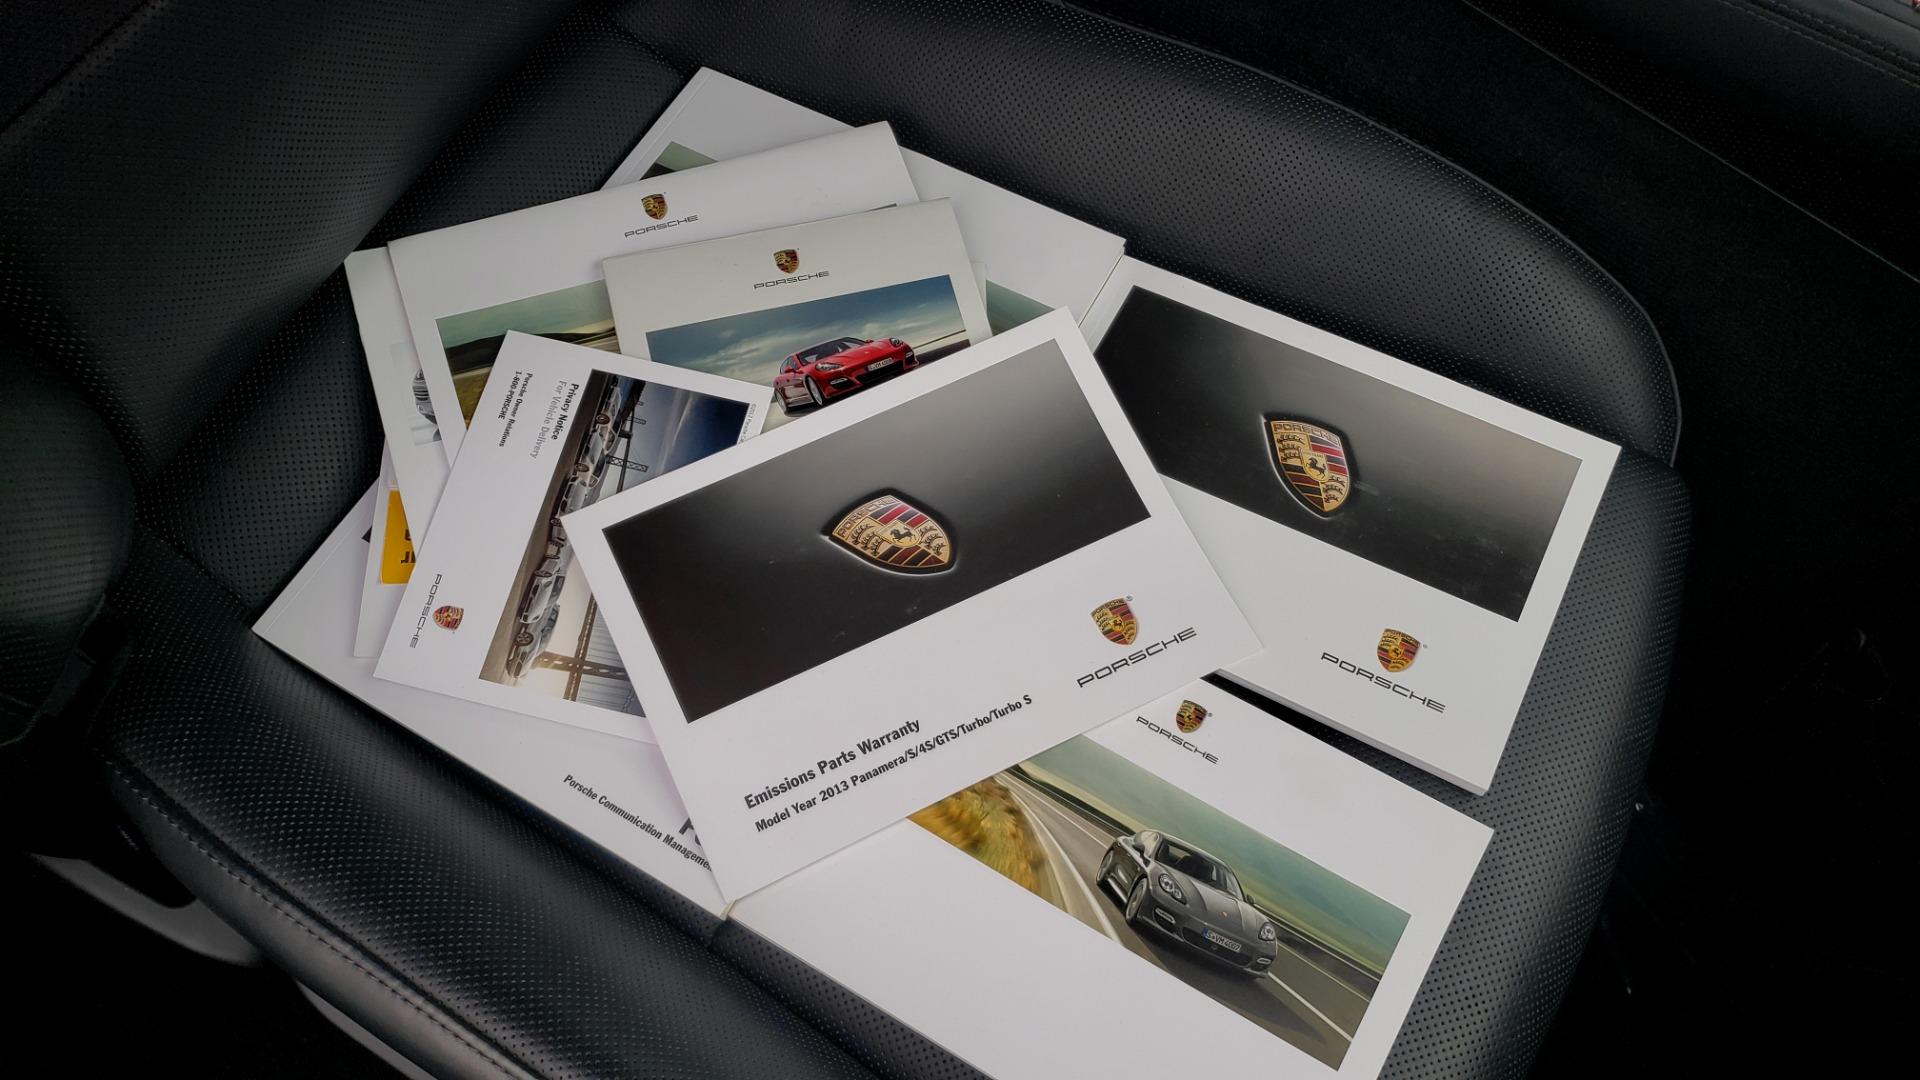 Used 2013 Porsche PANAMERA TURBO 4.8L V8 / AWD / NAV / SUNROOF / LCA / PARK ASST / BURMESTER for sale $45,995 at Formula Imports in Charlotte NC 28227 101